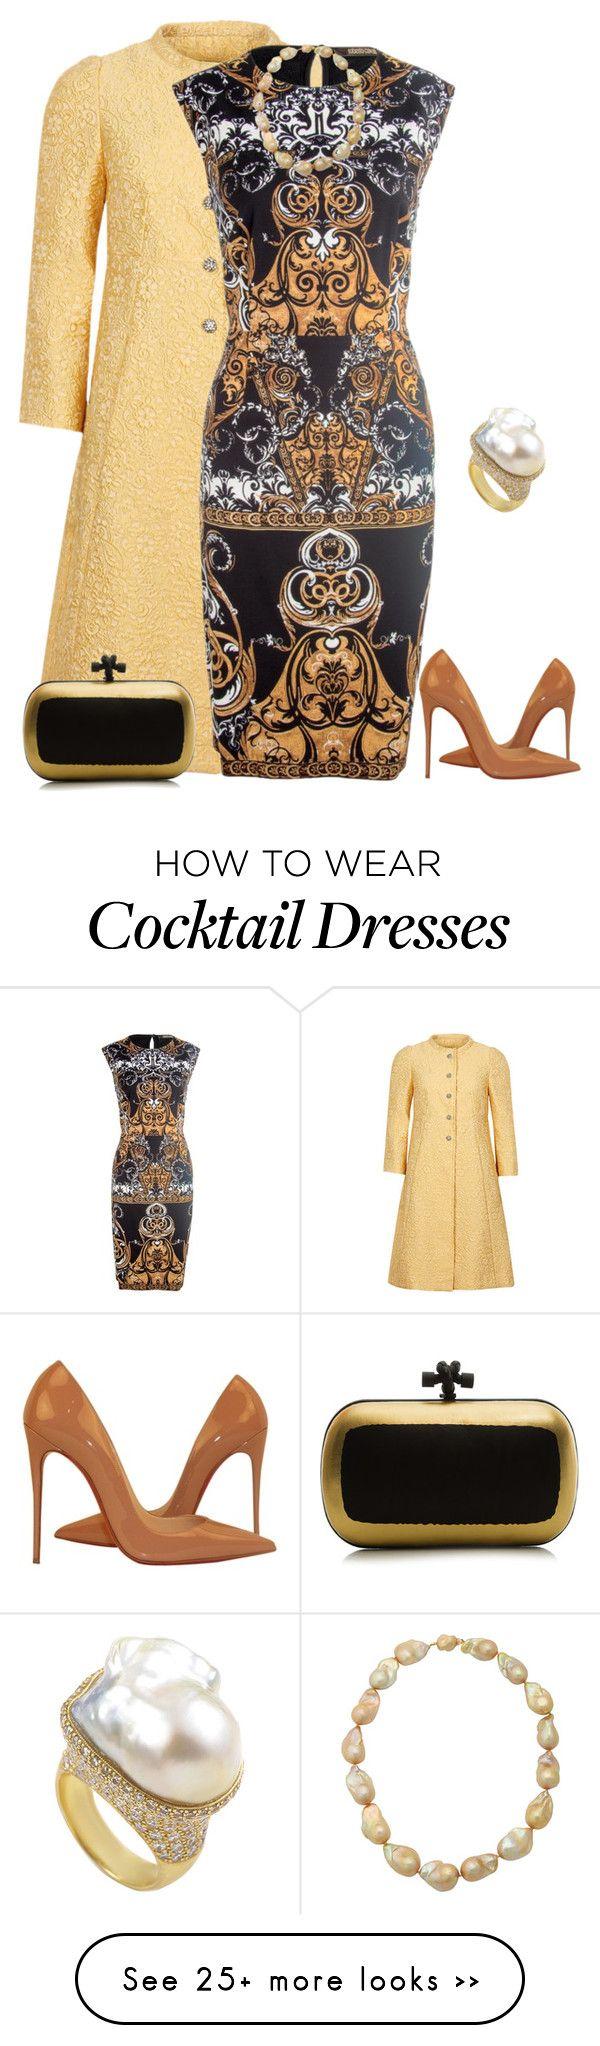 """outfit 2340"" by natalyag on Polyvore featuring Dolce&Gabbana, Jose Hess, Christian Louboutin and Bottega Veneta"